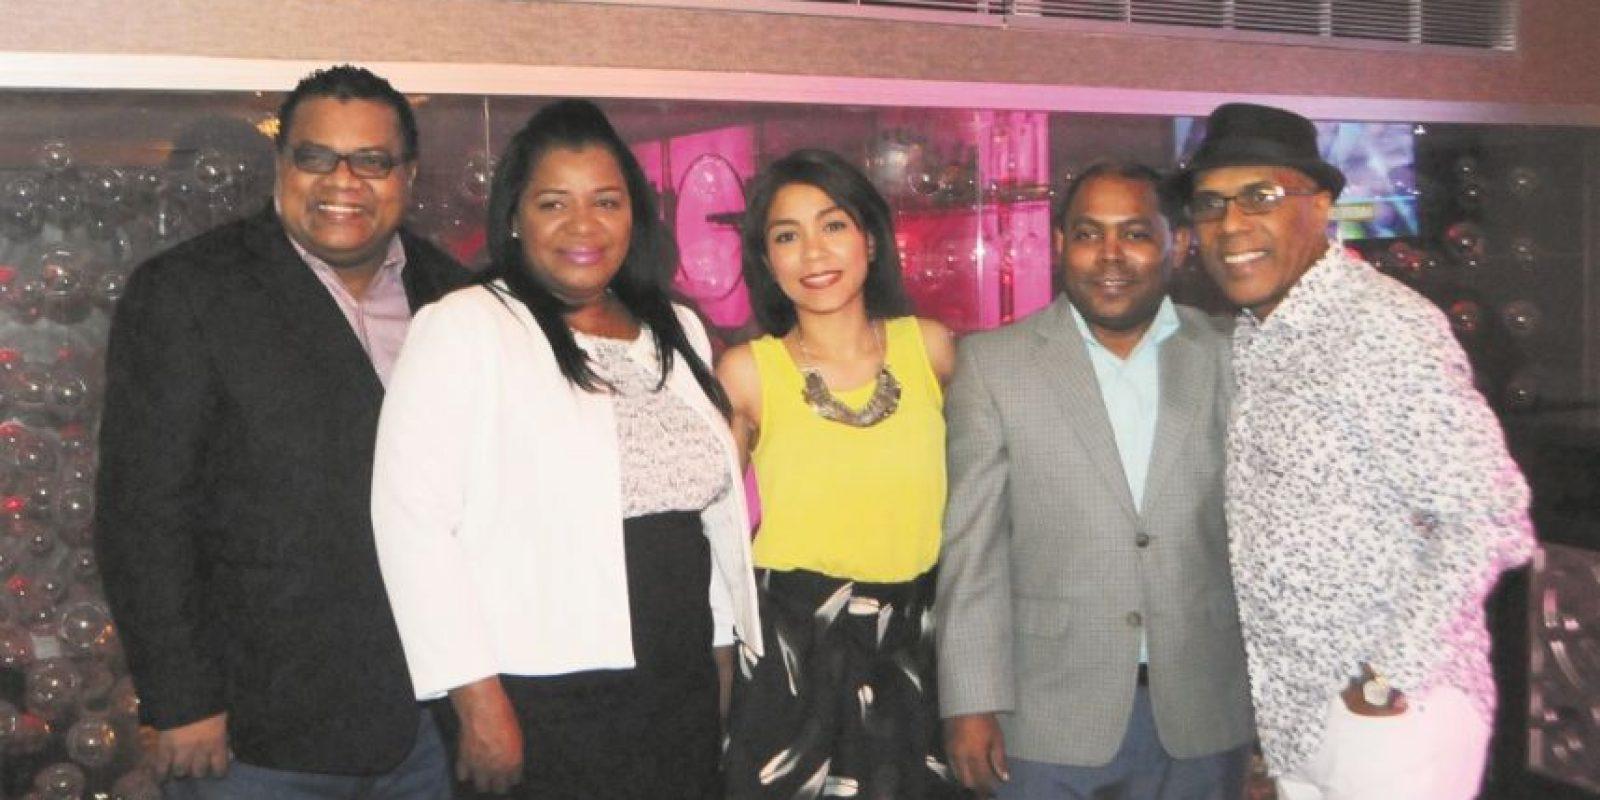 Pochy Familia, Cristina liriano, Evelyn Estrella, Fausto Polanco y Ramón Orlando. Foto:Fuente externa